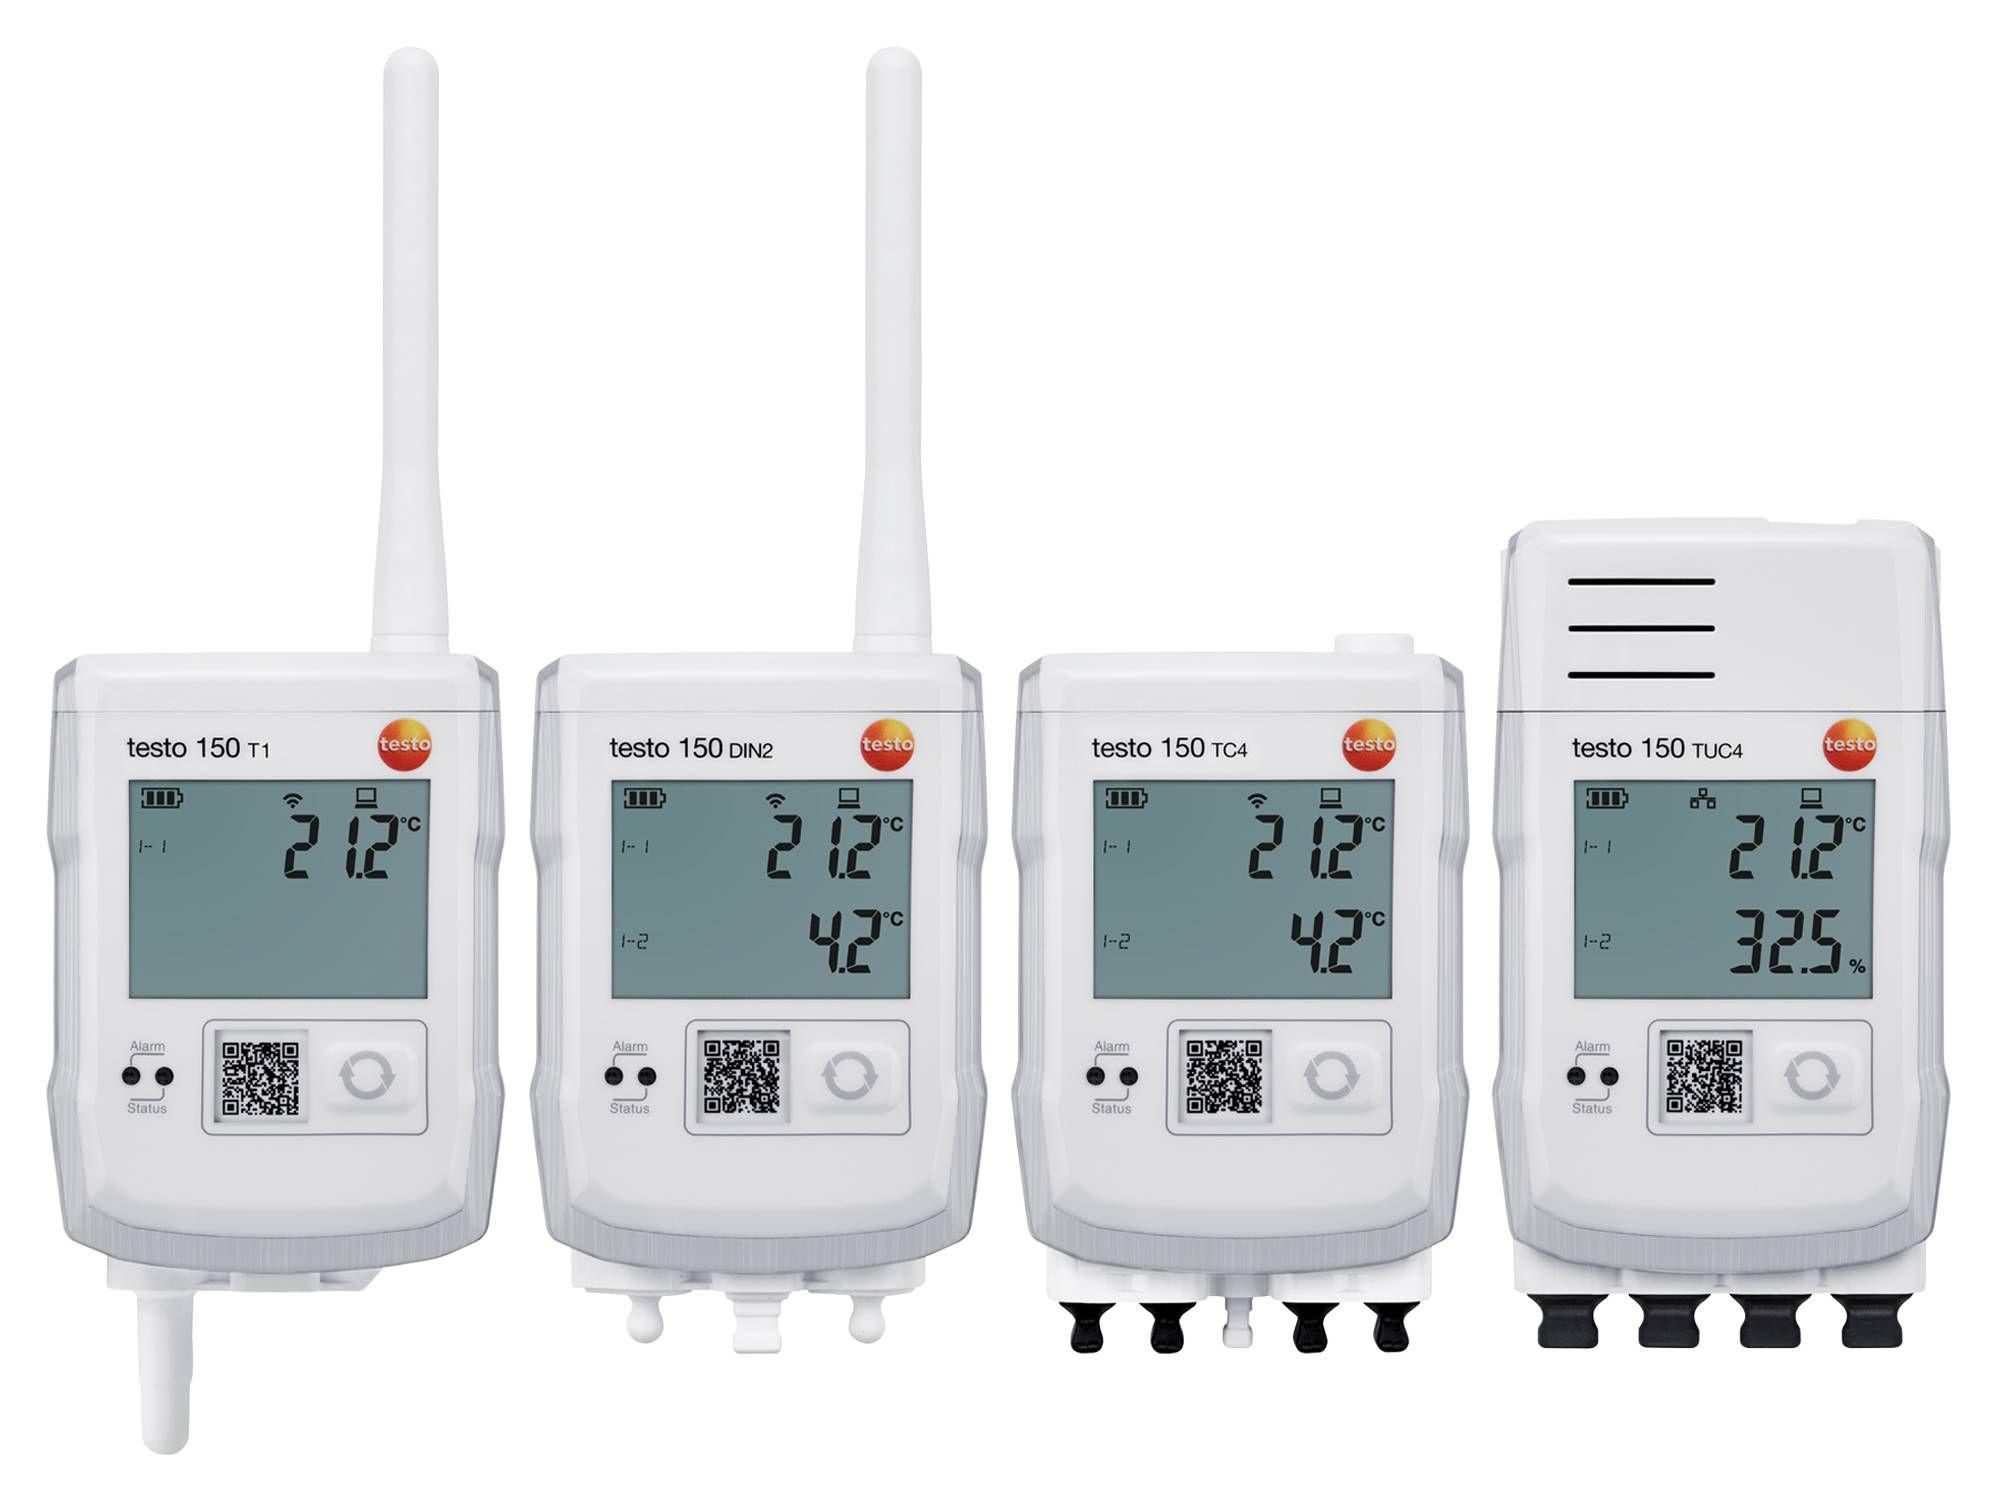 testo Saveris 生命科学环境监测系统——数据记录仪